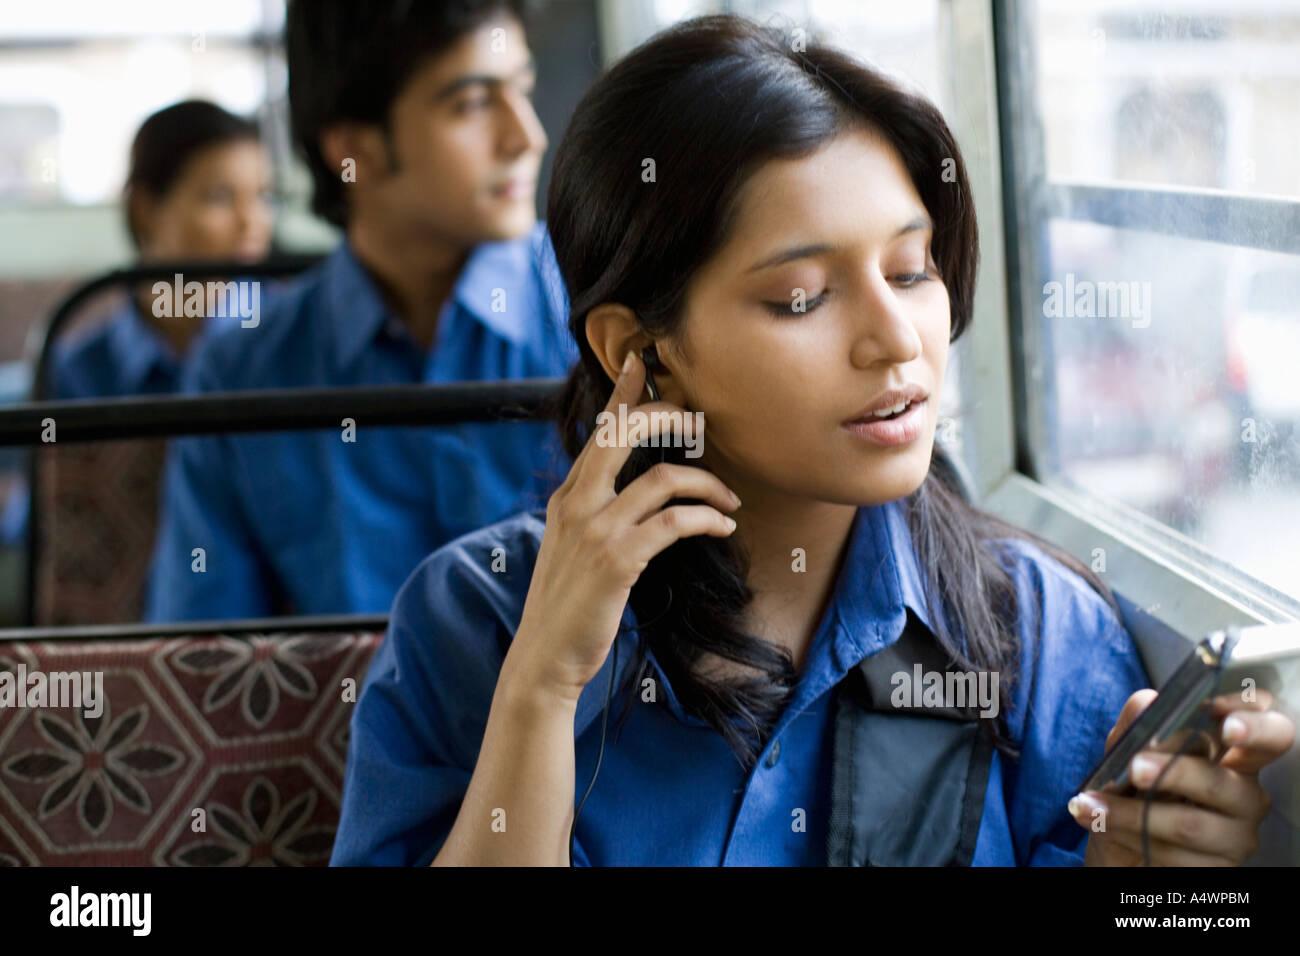 Studentin, anhören von MP3-Player in bus Stockbild